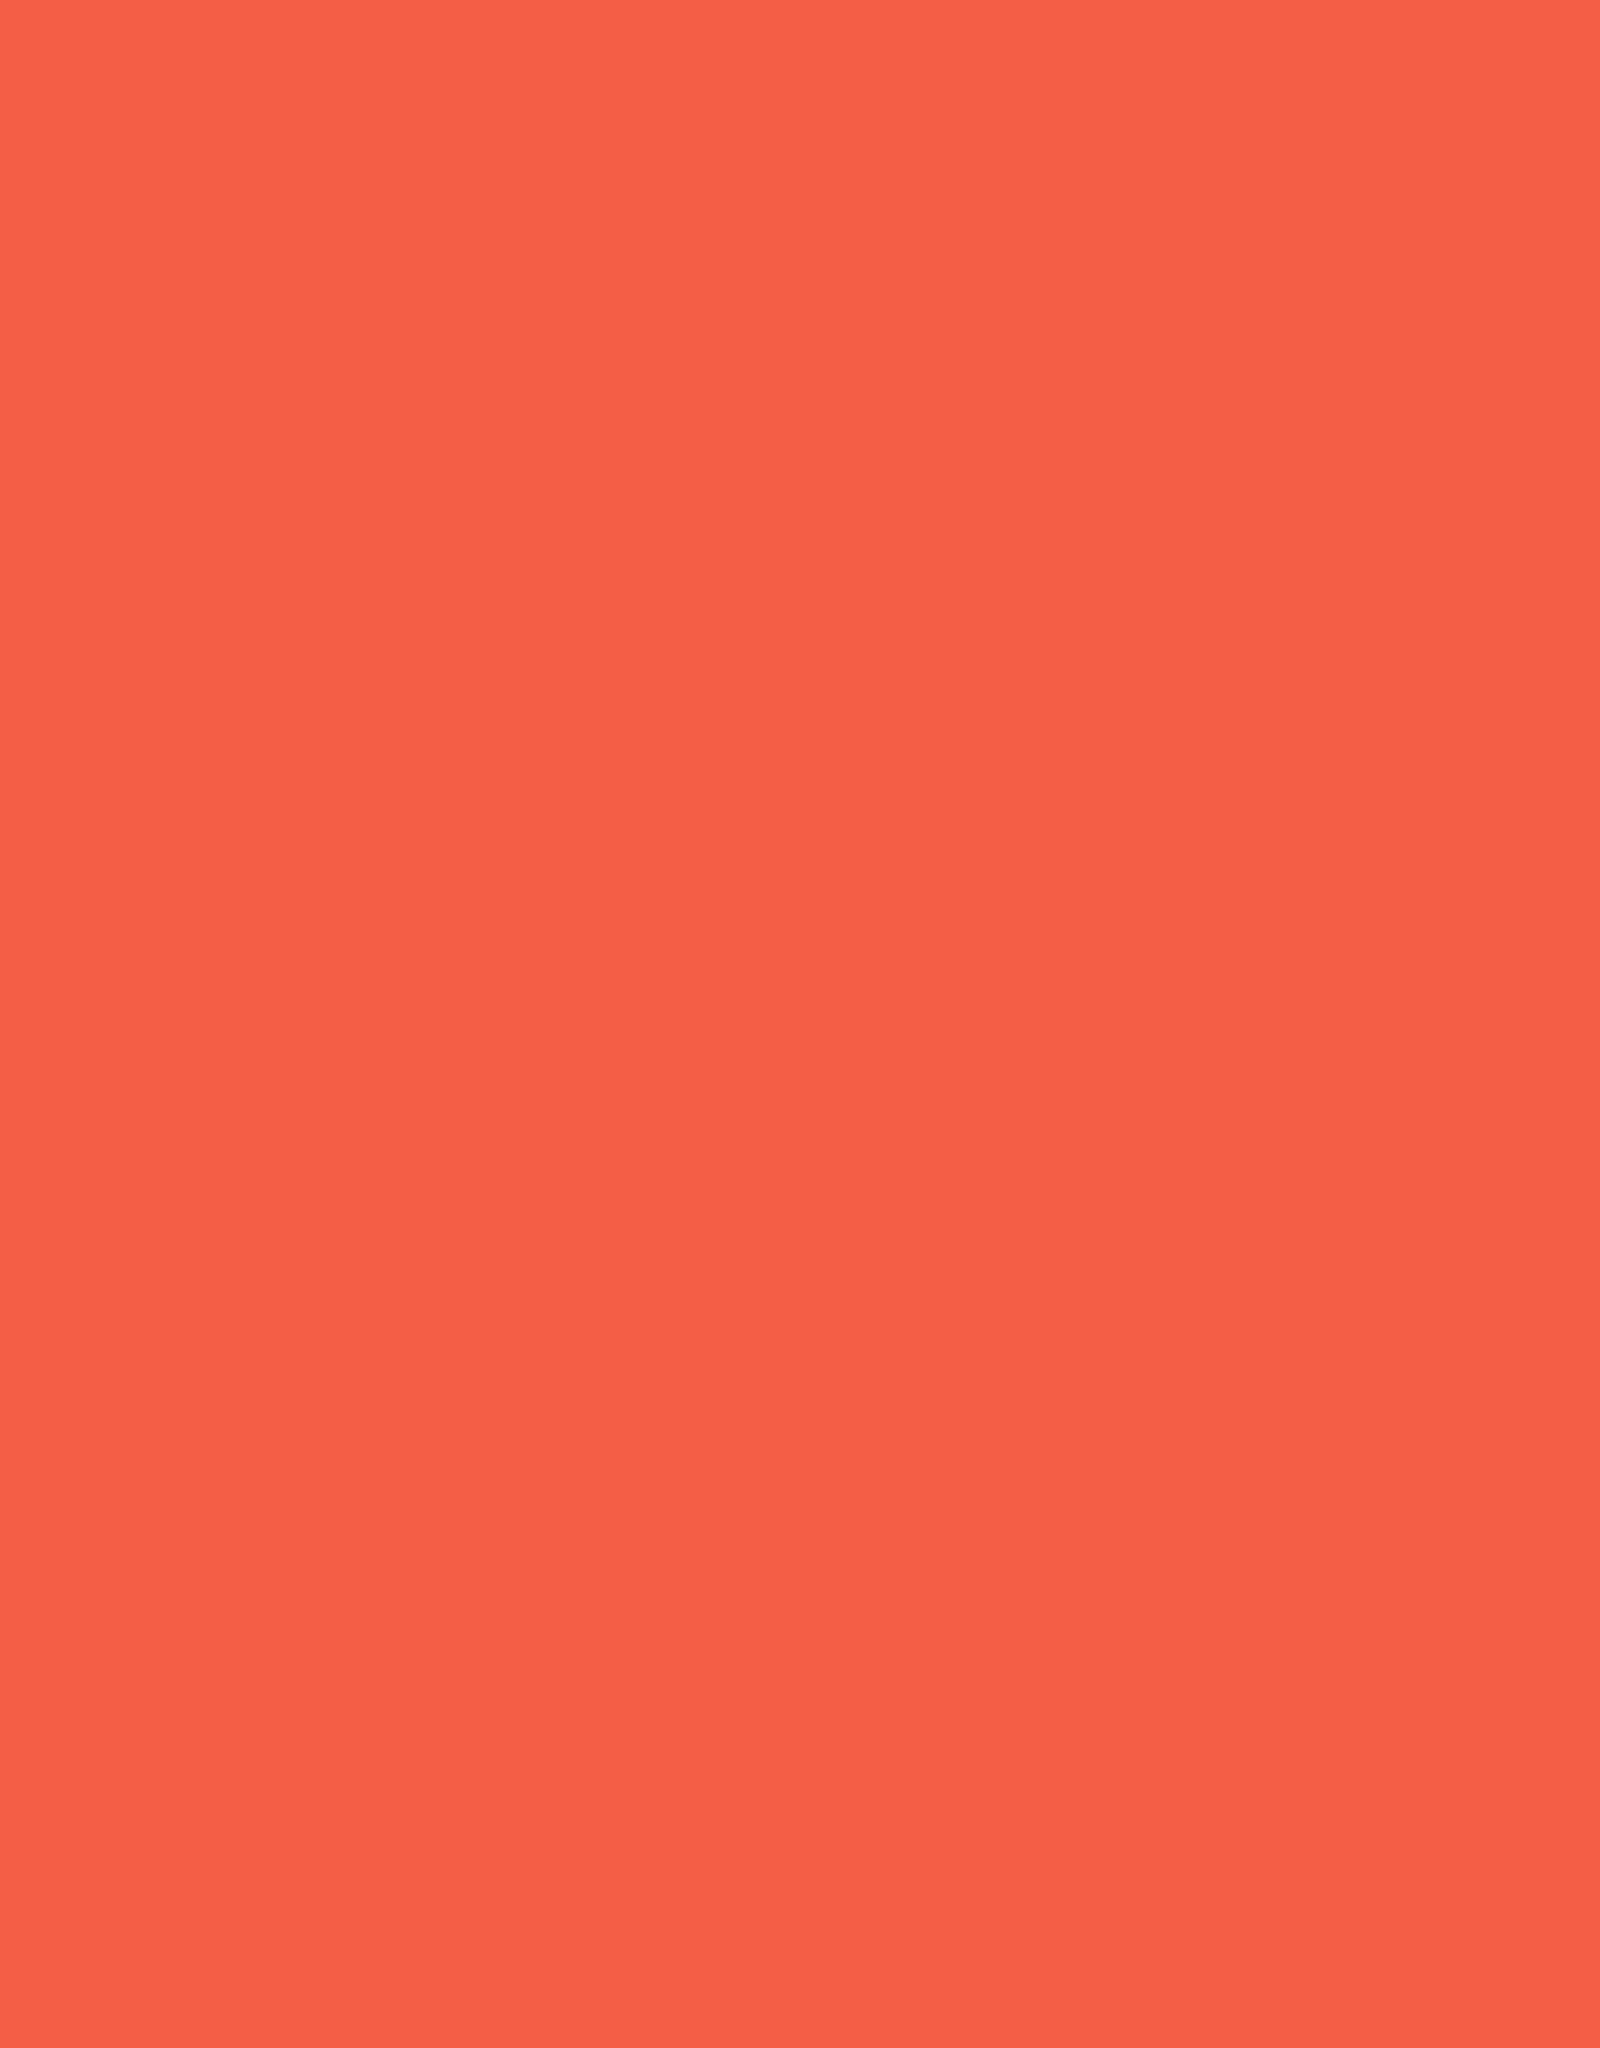 Superior Seamless Superior Seamless Bright Orange #39